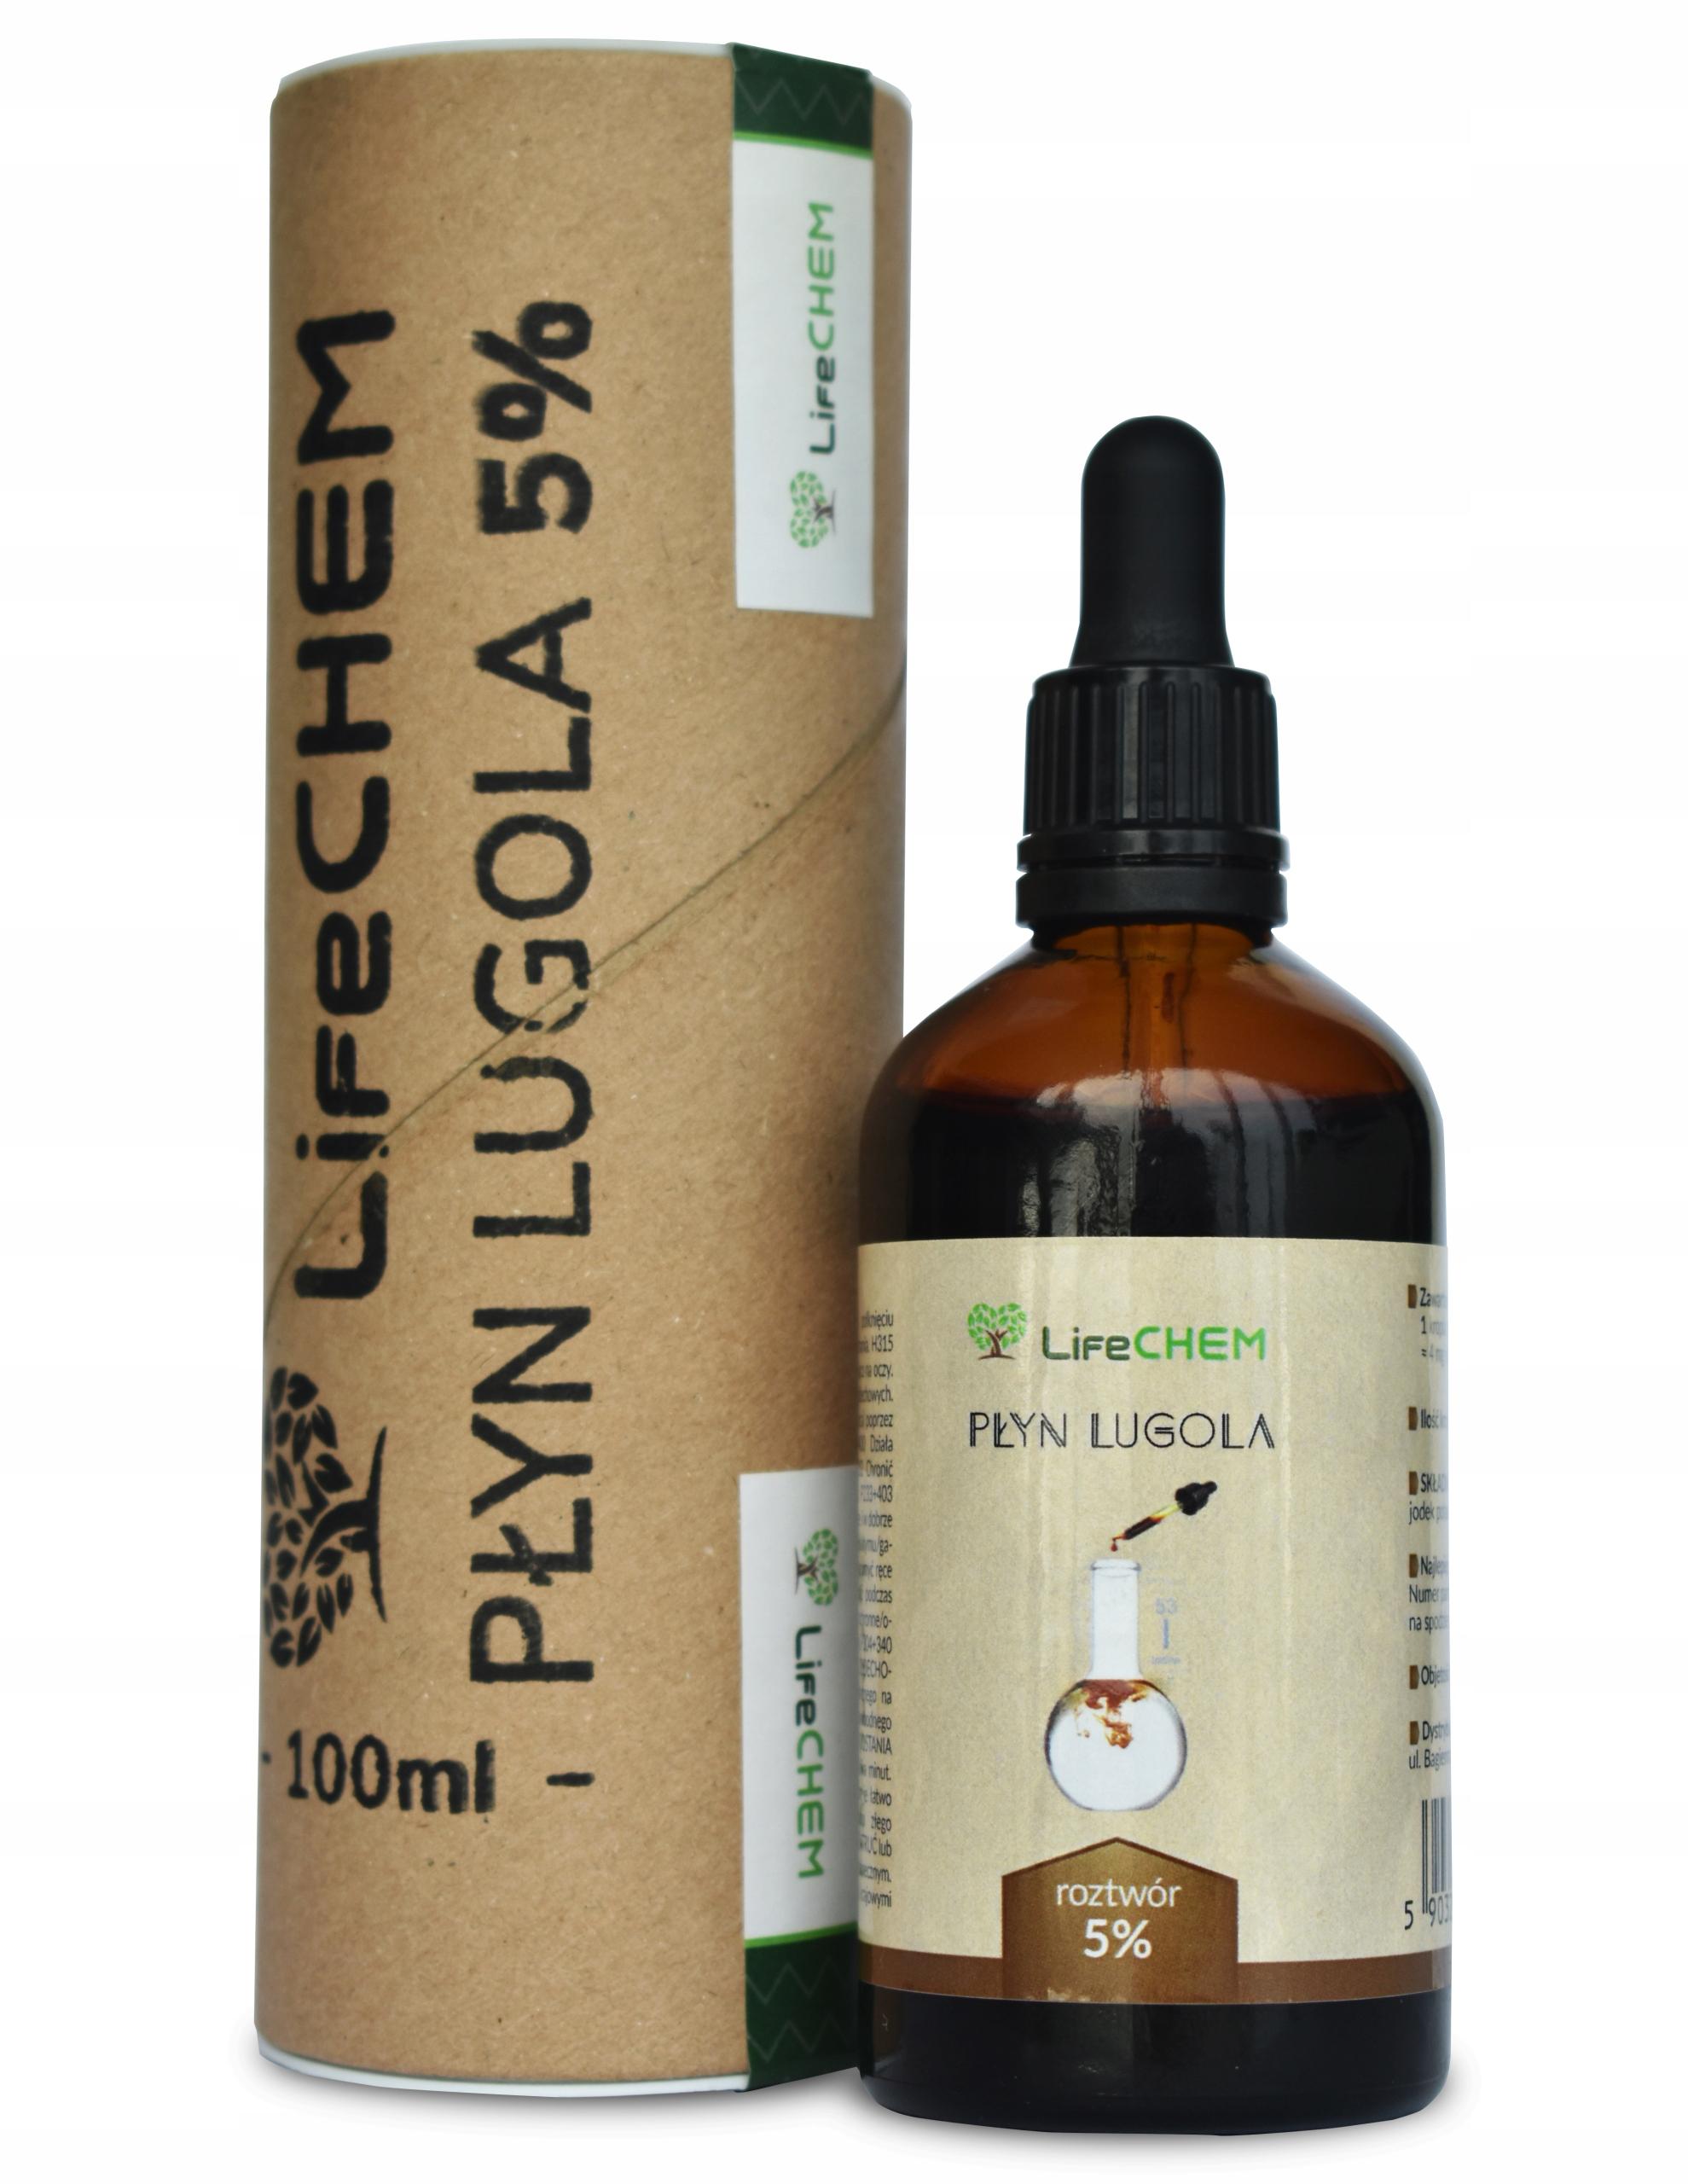 Лугола жидкость 5% 100мл - JOD Чистая КЗДА - LifeCHEM